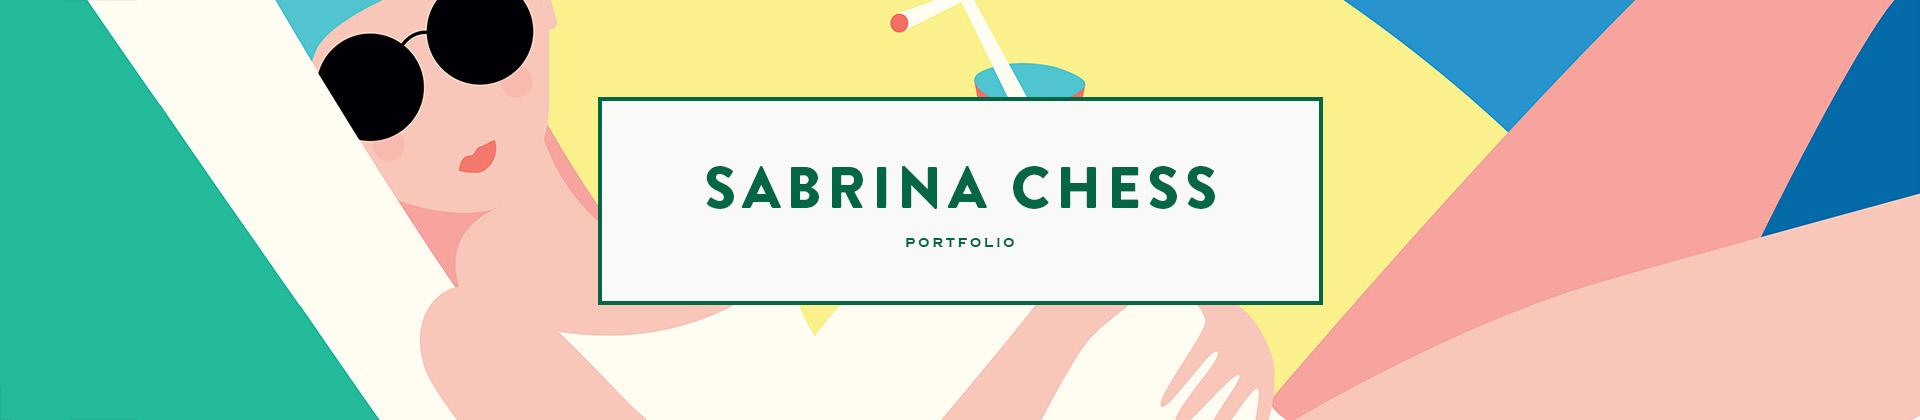 Sabrina Chess